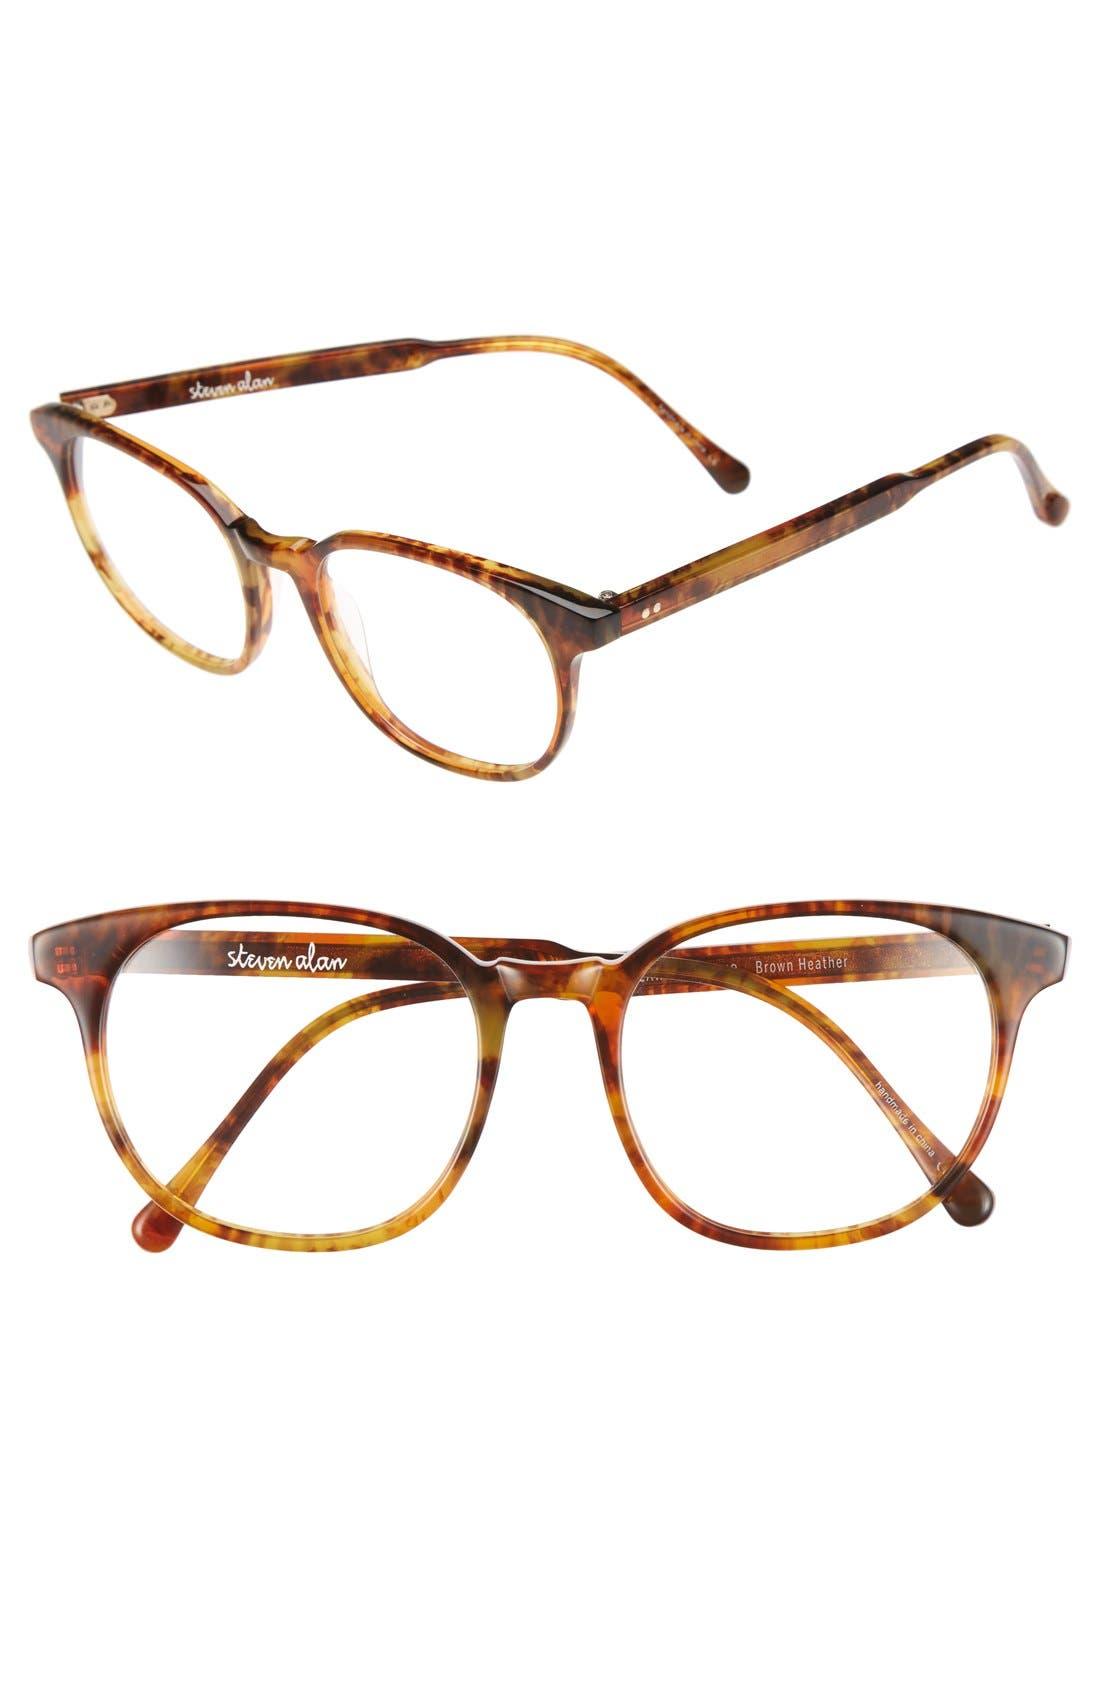 Main Image - Steven Alan 'High Lawn' 52mm Optical Glasses